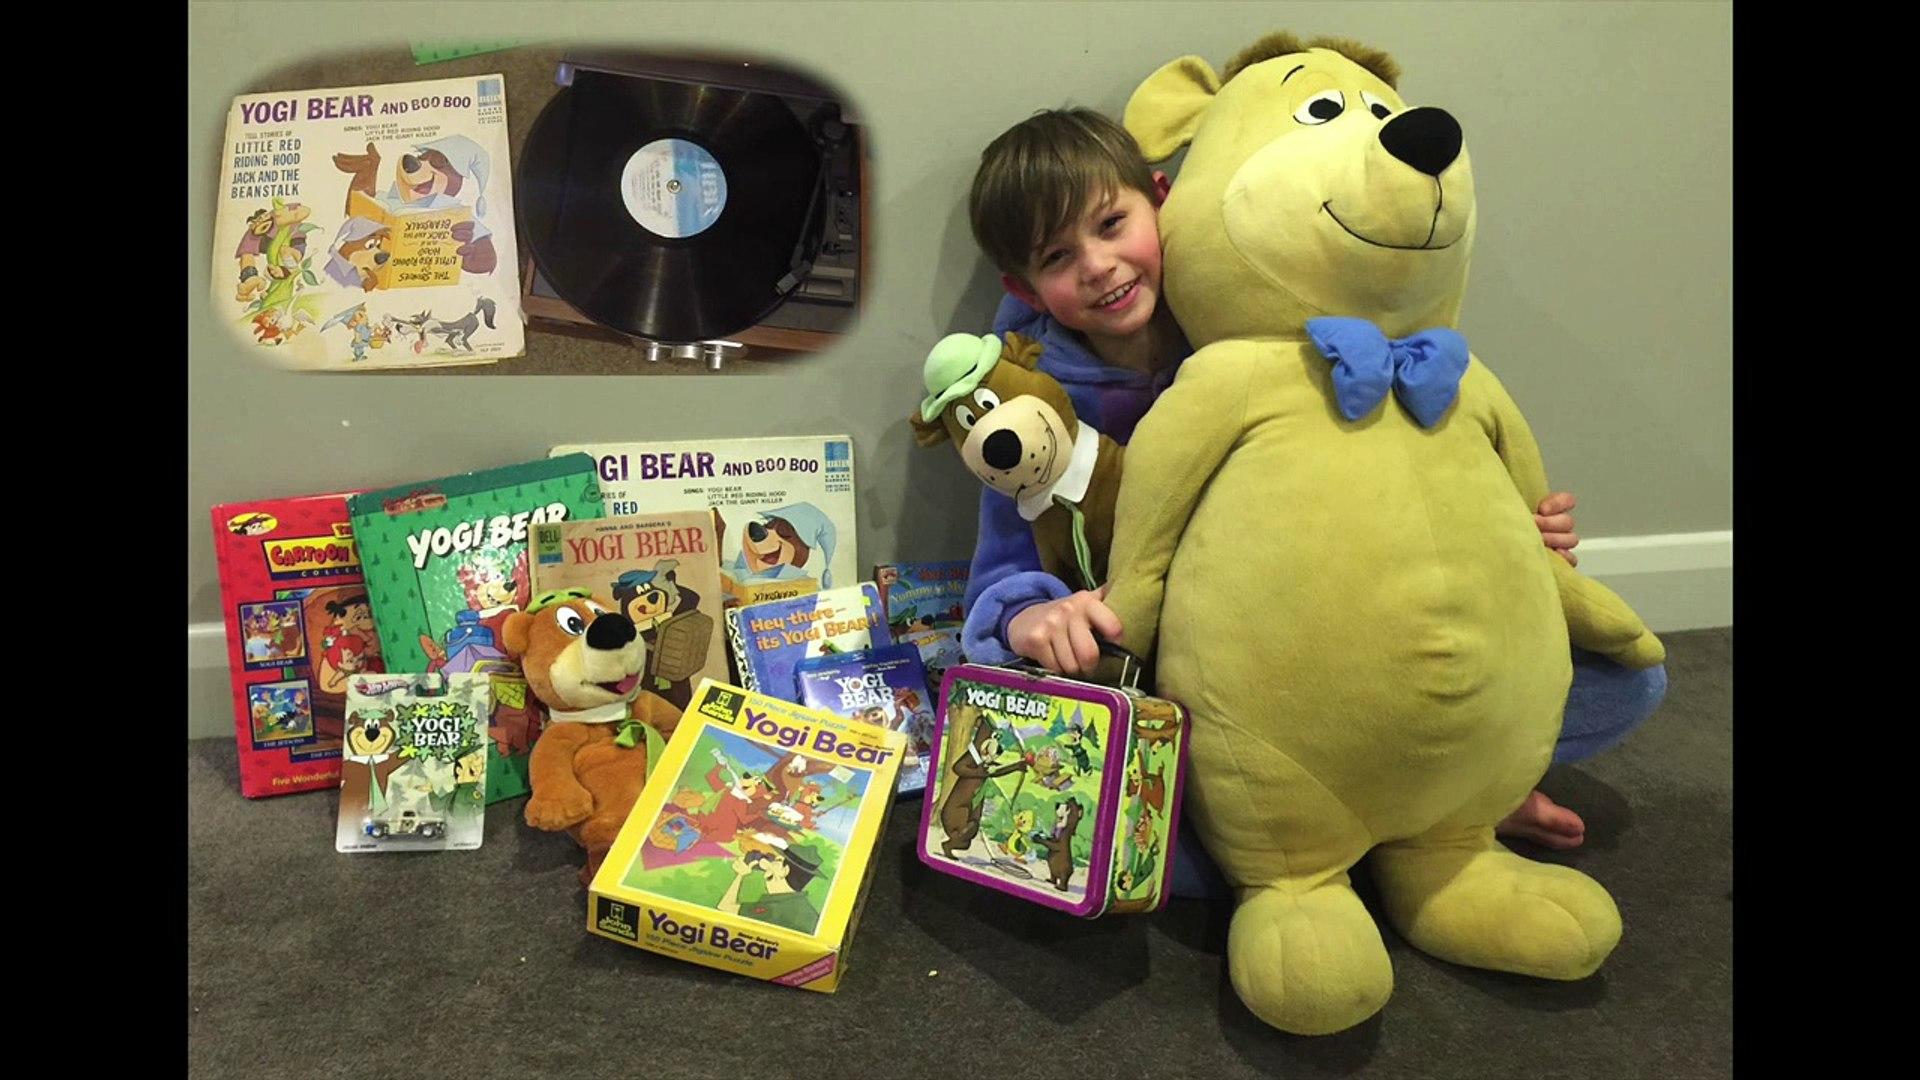 Yogi Bear & Boo Boo tell stories of Jack & the Beanstalk